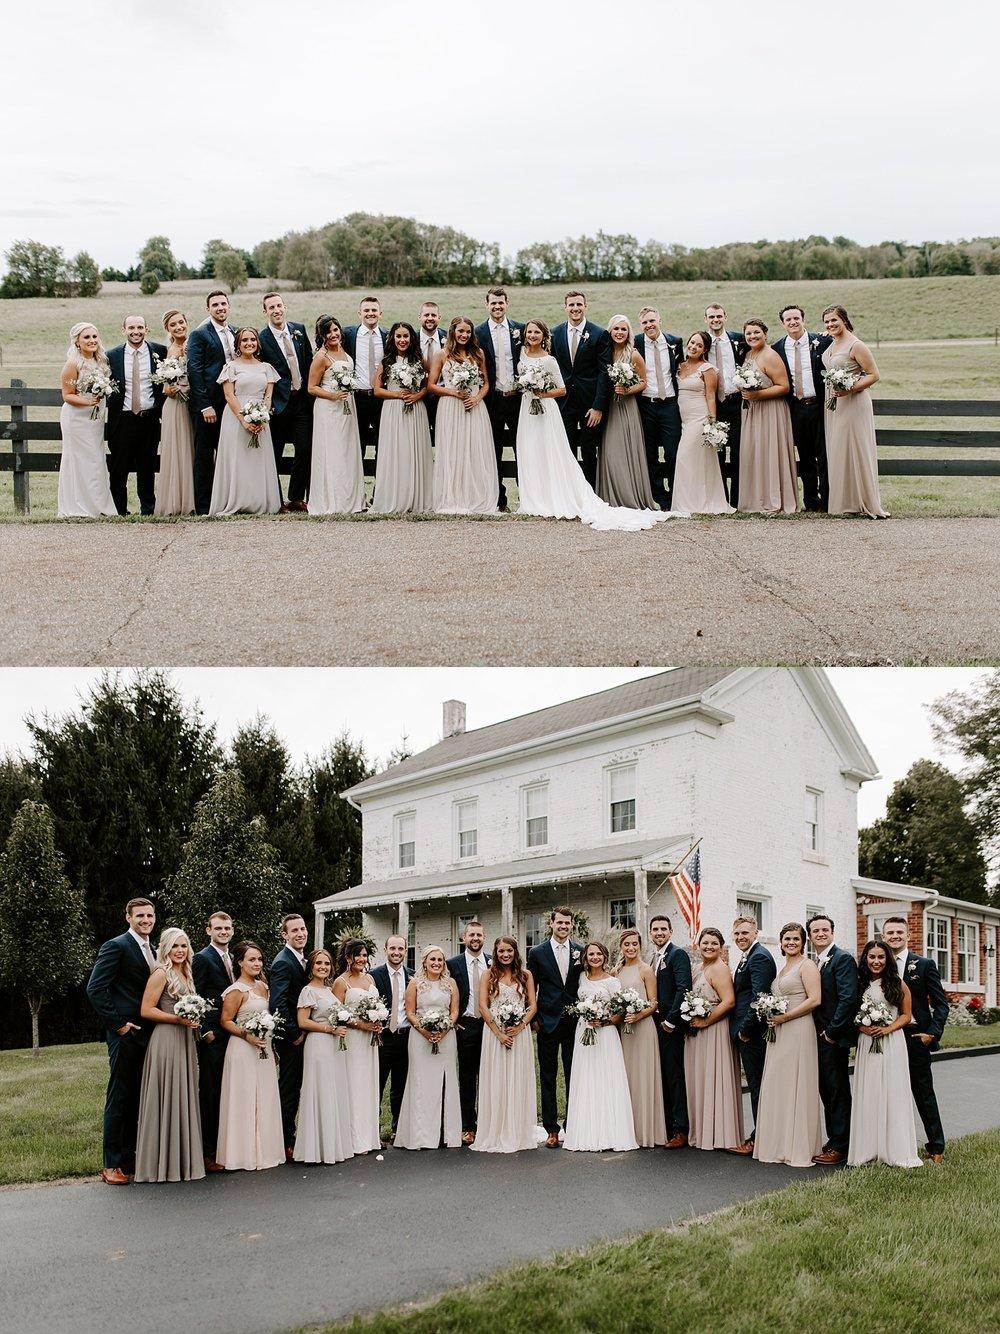 2018-09-23_0006ashley-sara-photography-pittsburgh-photographer-wedding-photographer-brookside-farm-wedding-louisville-ohio.jpg